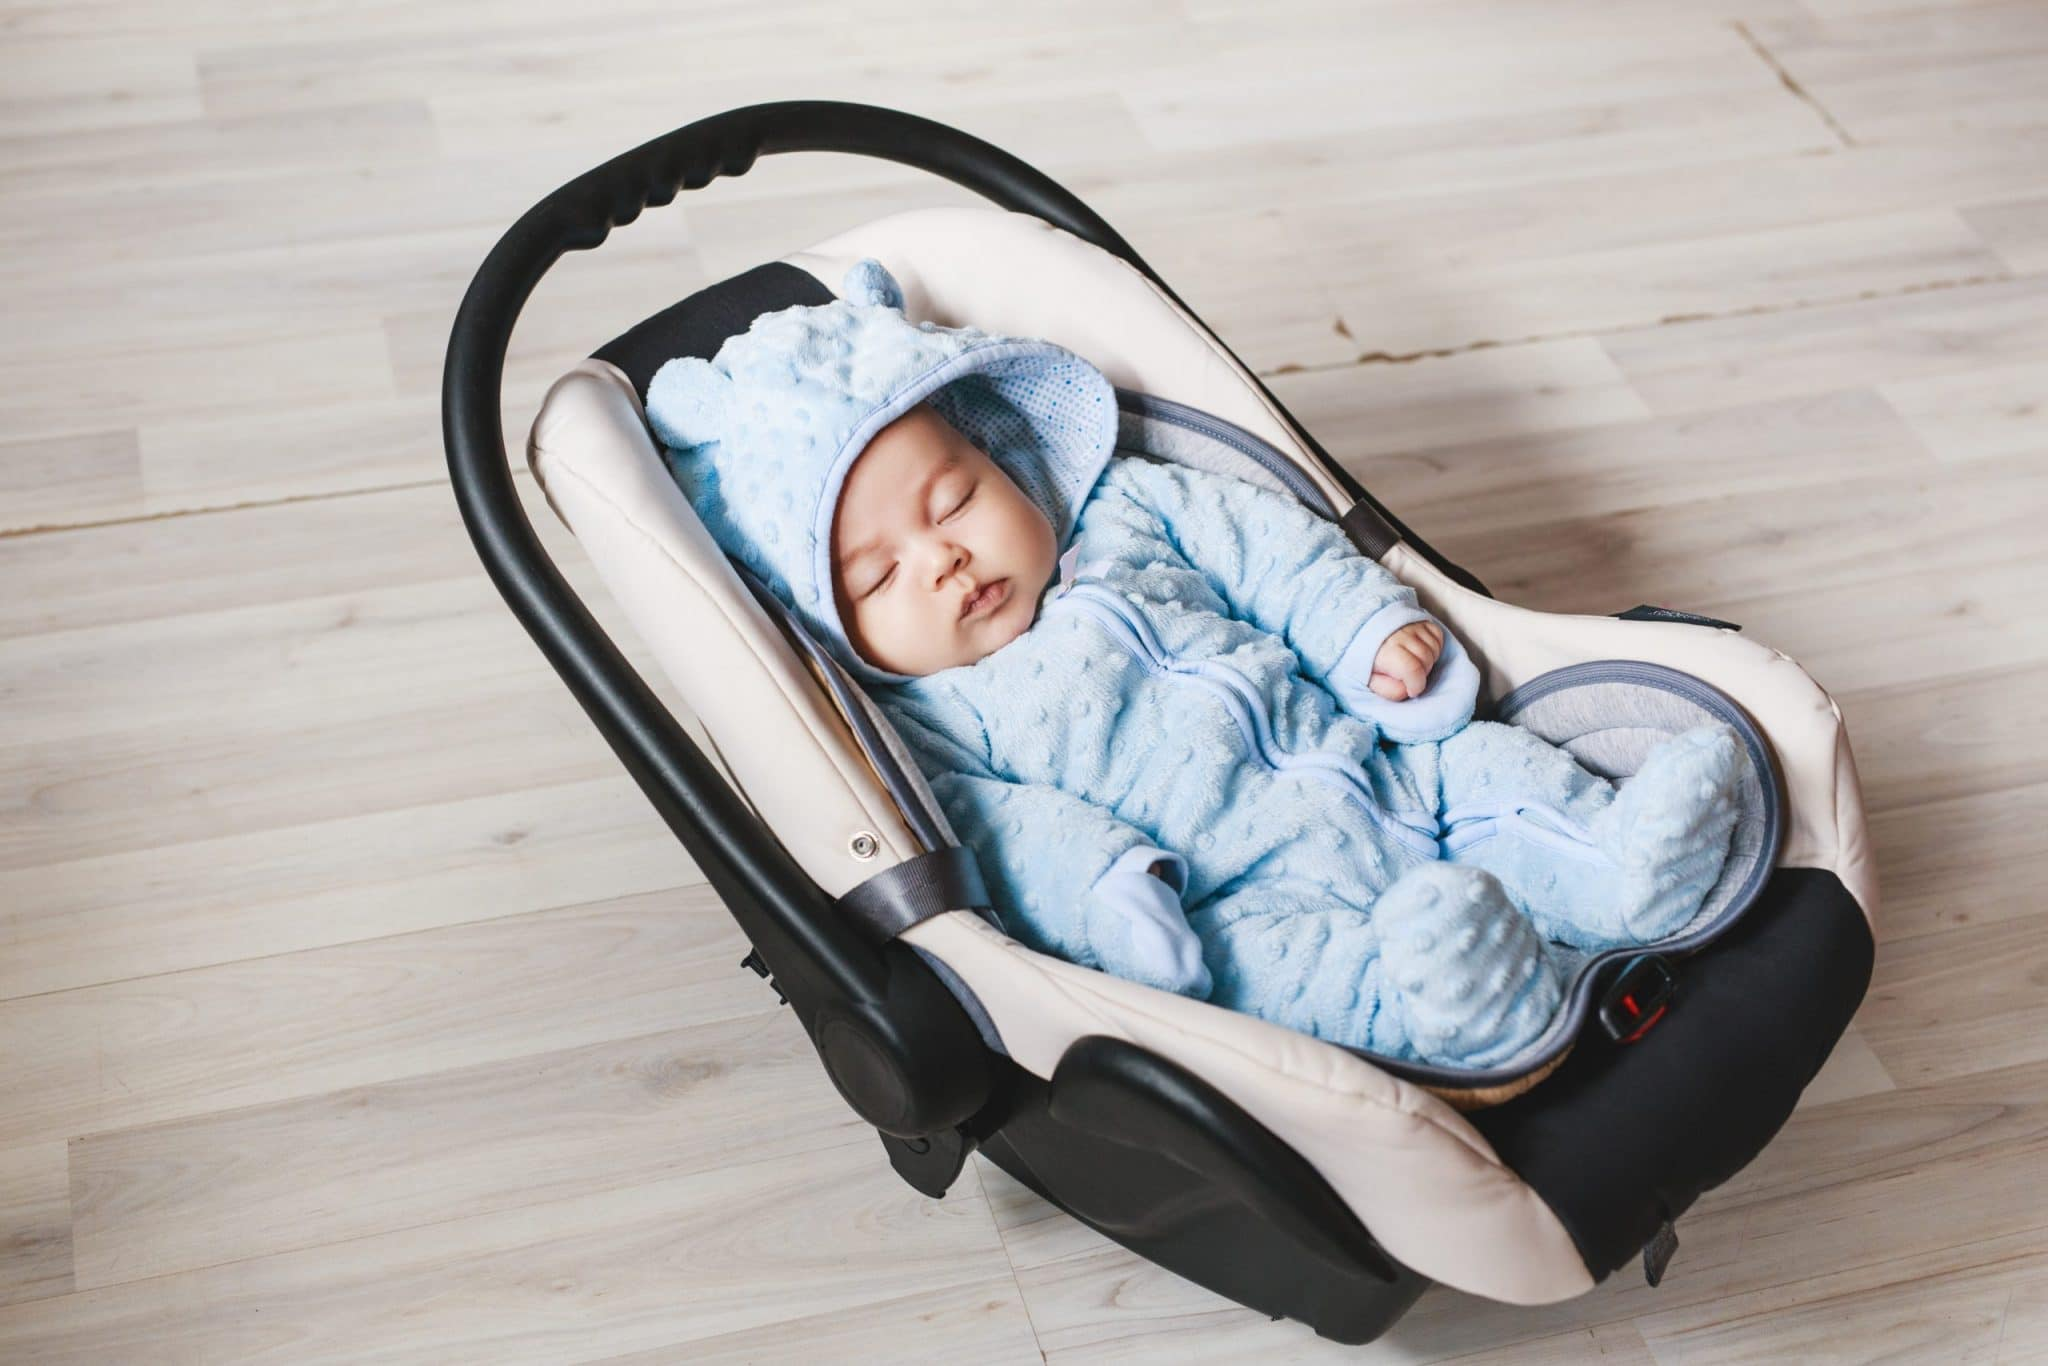 Pediatric Transport